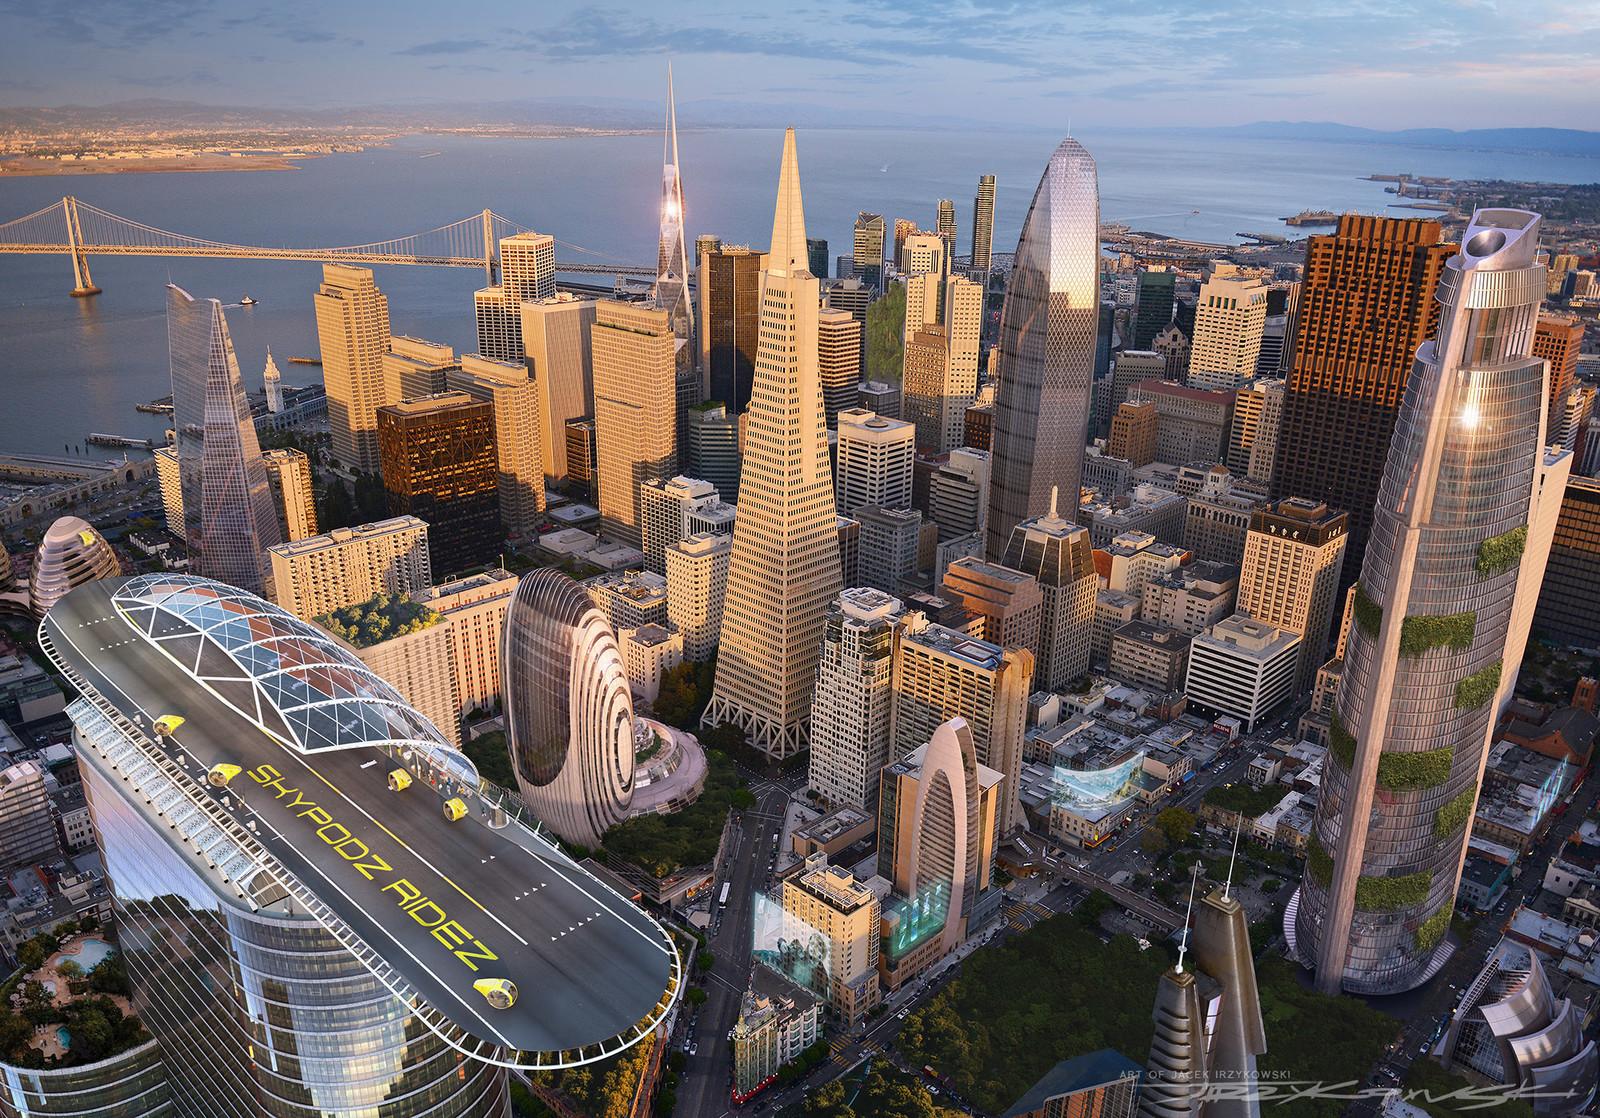 Futuristic San Francisco